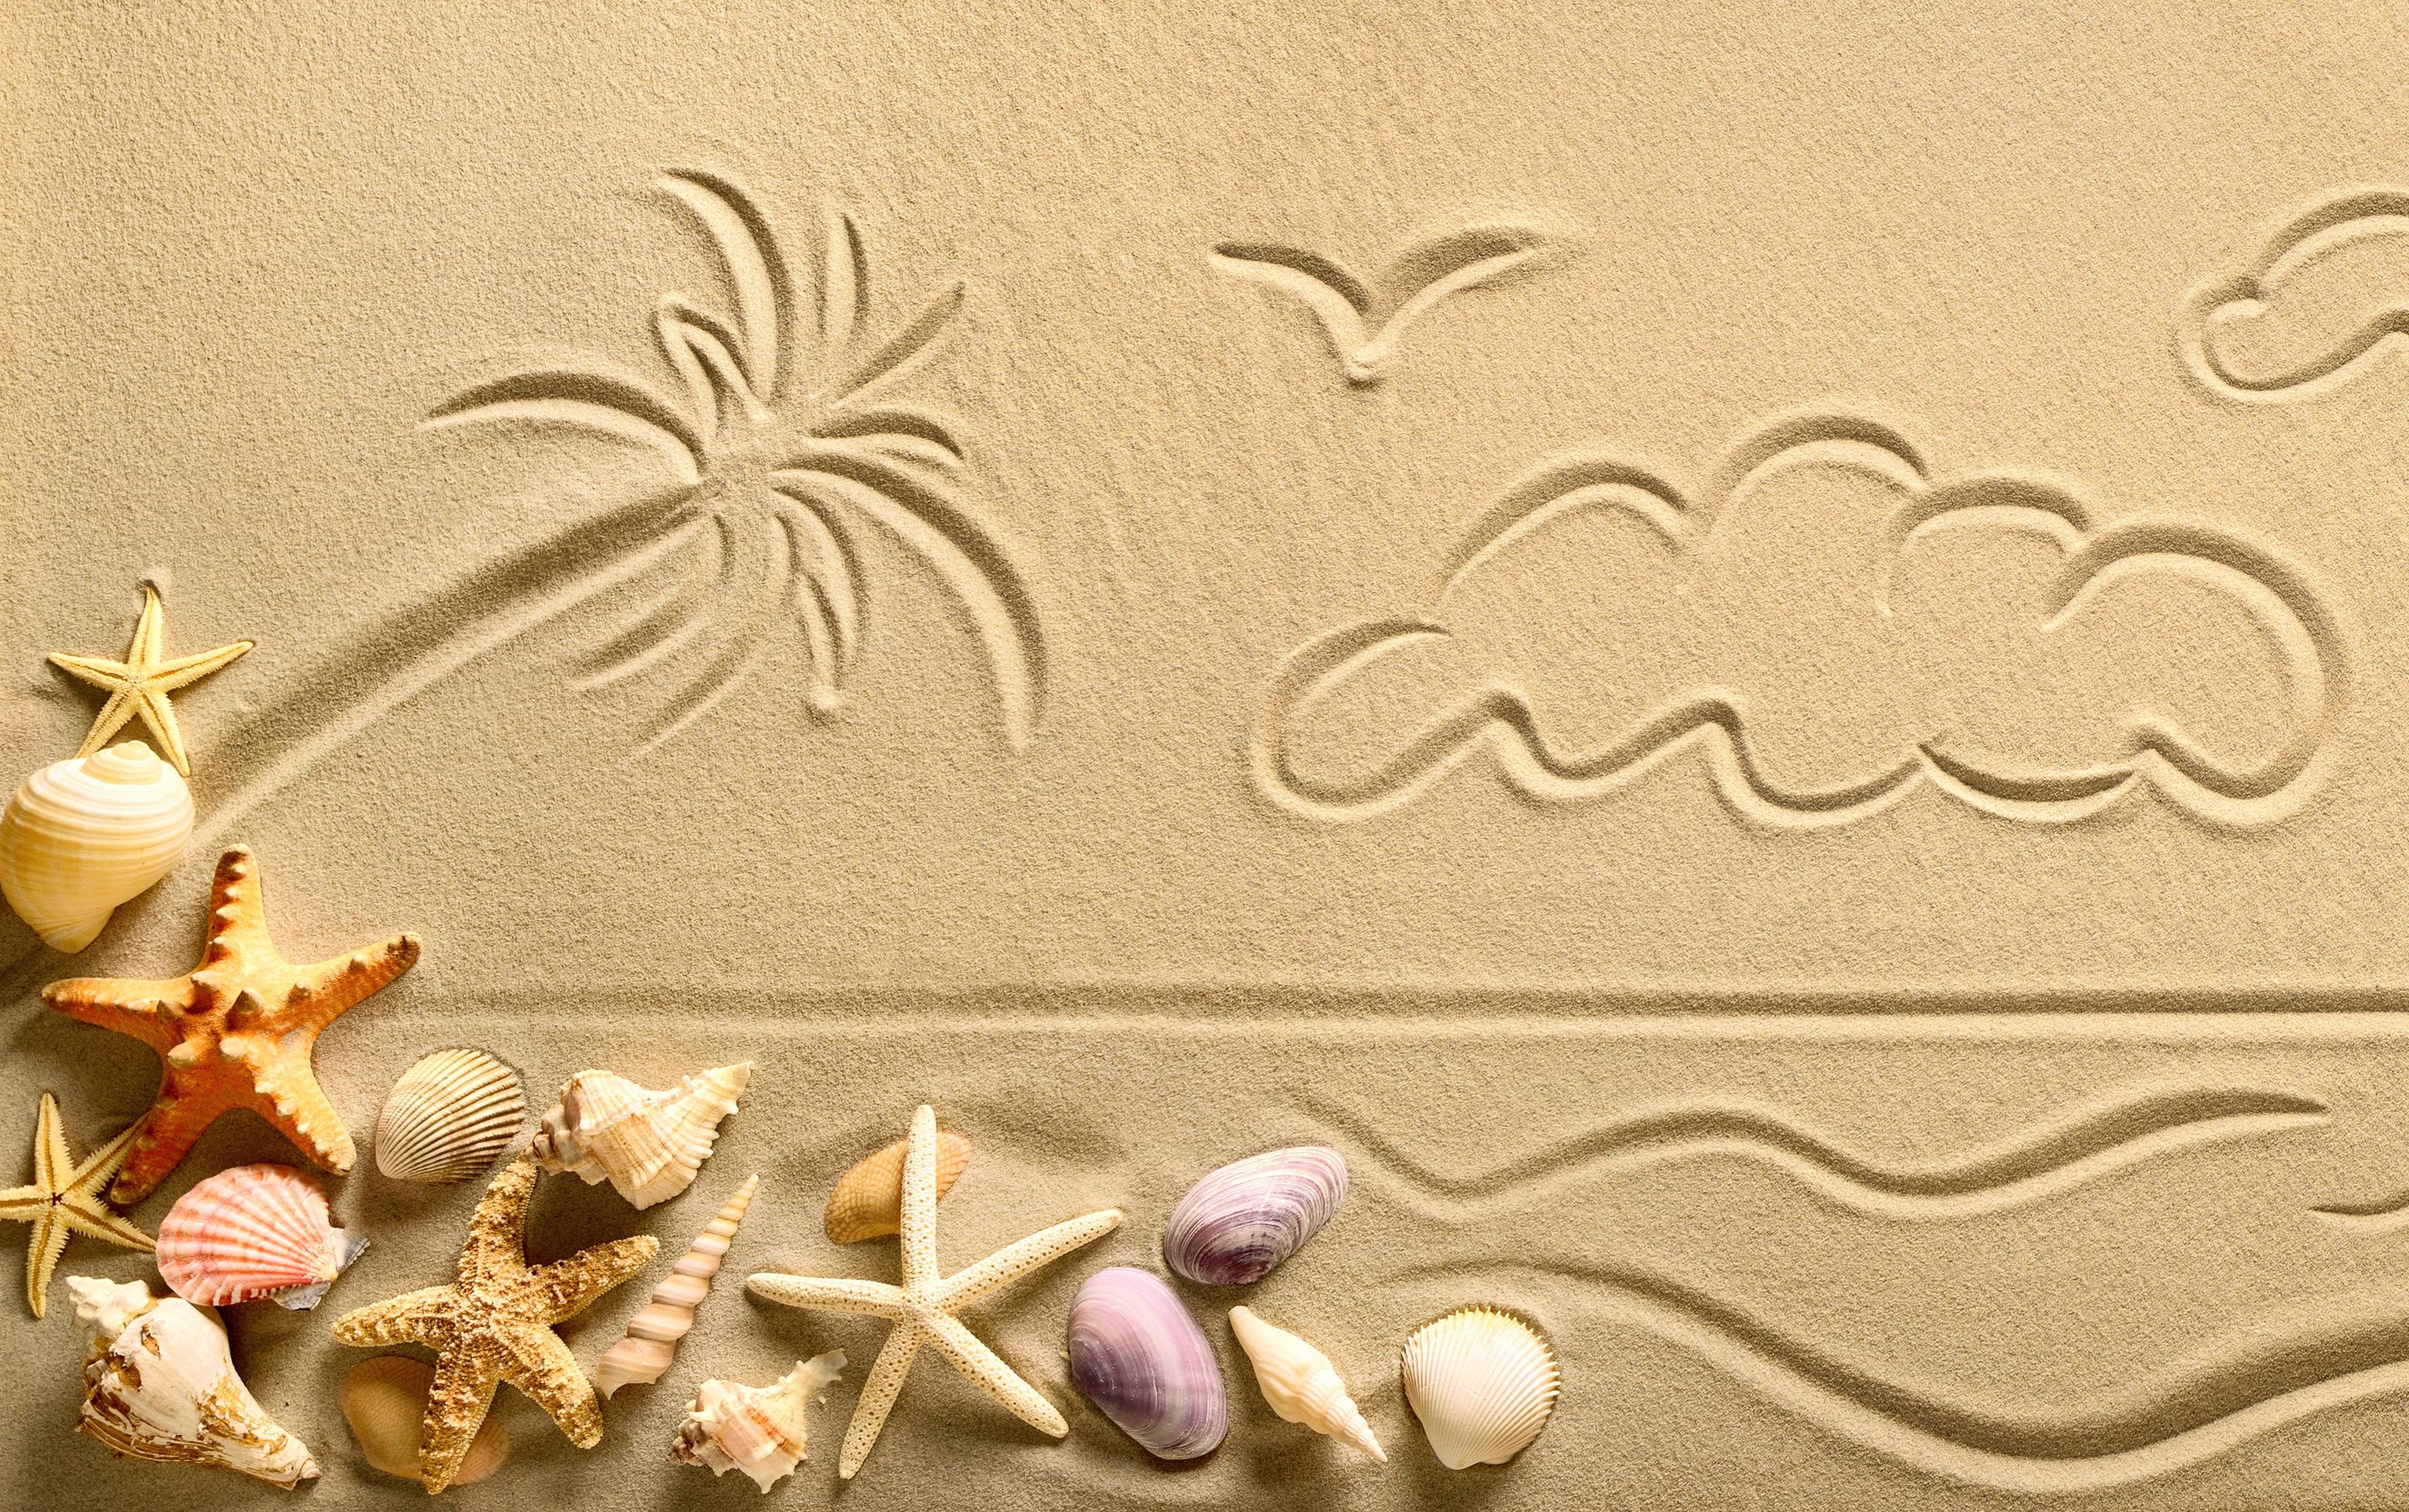 фон песка для презентации часто